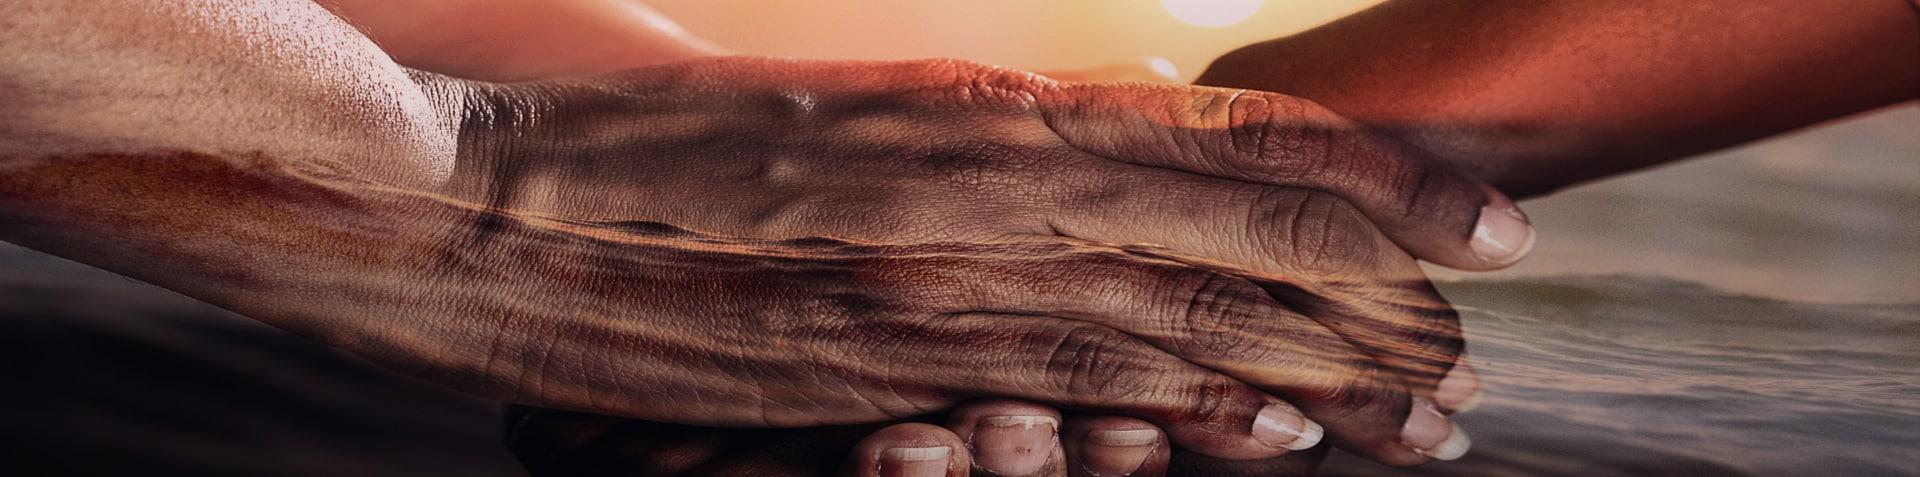 Handschlag verschiedener Nationen Rechtsanwalt Ausländerrecht